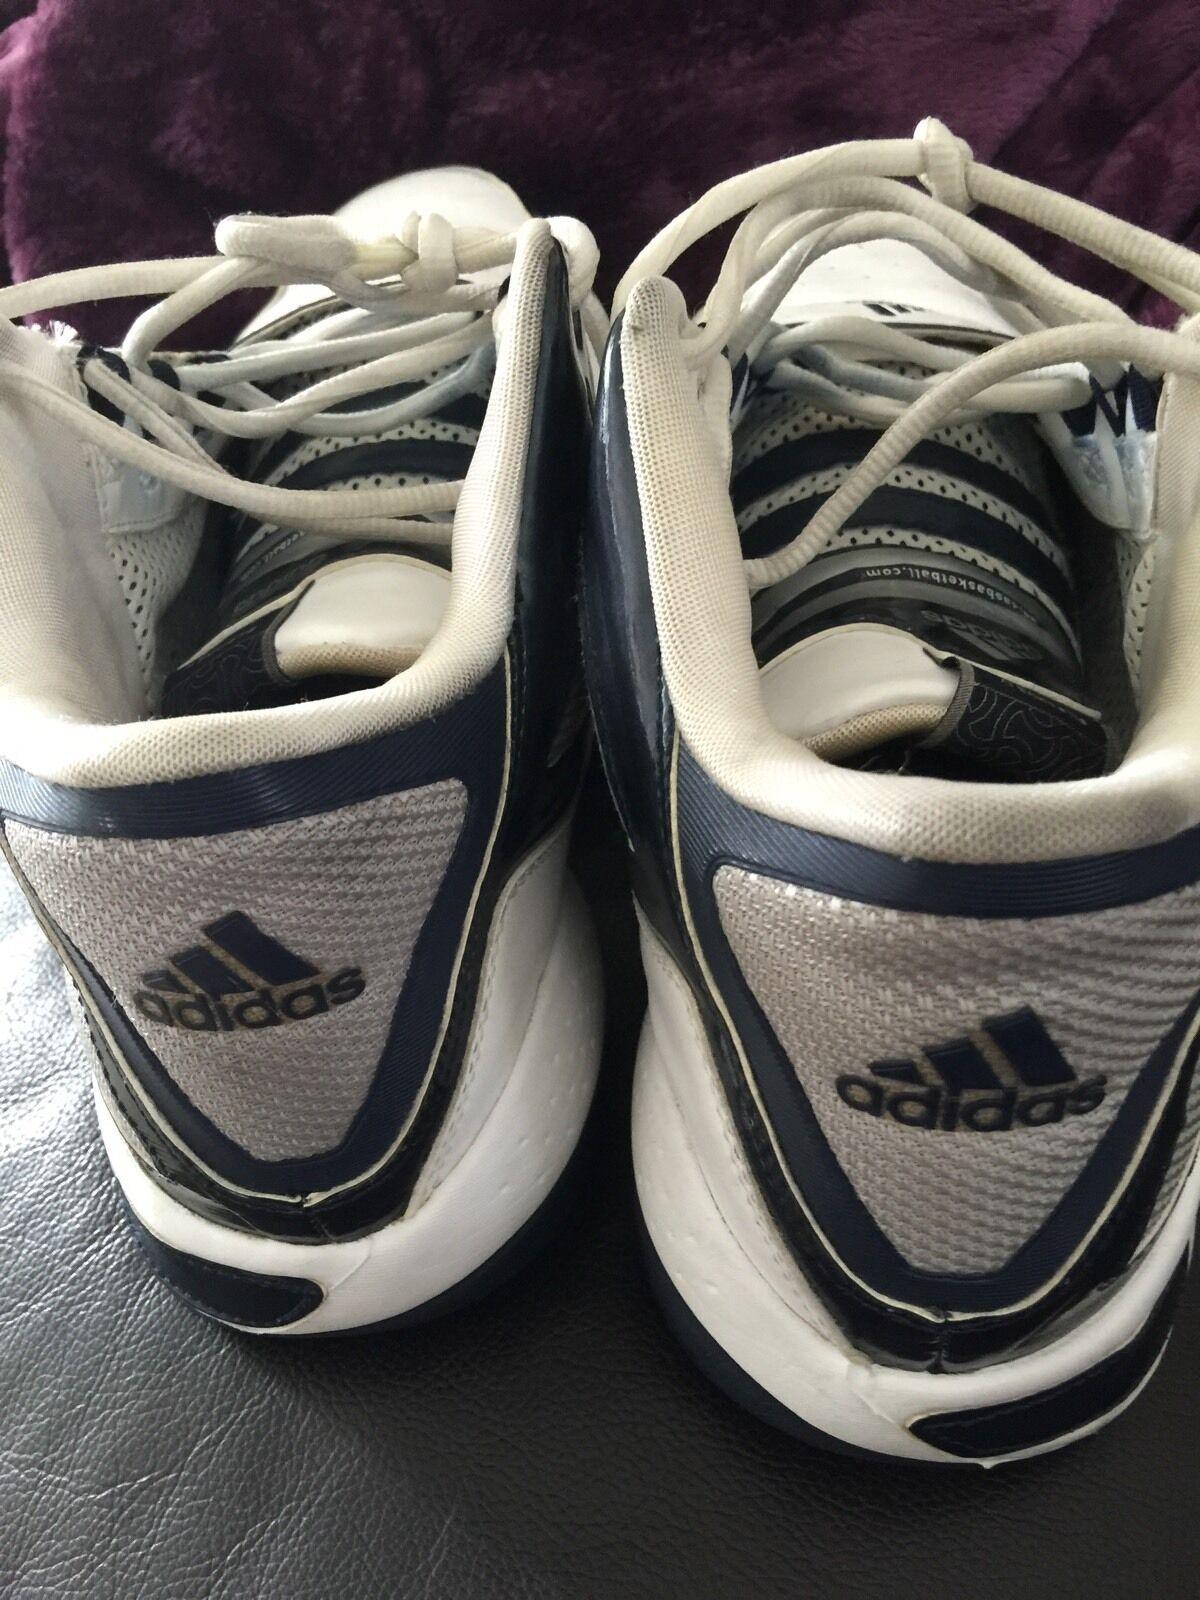 adidas pilrahna / 4 größe 12 wht / blau / pilrahna gry jahrgang rar! 22d6da